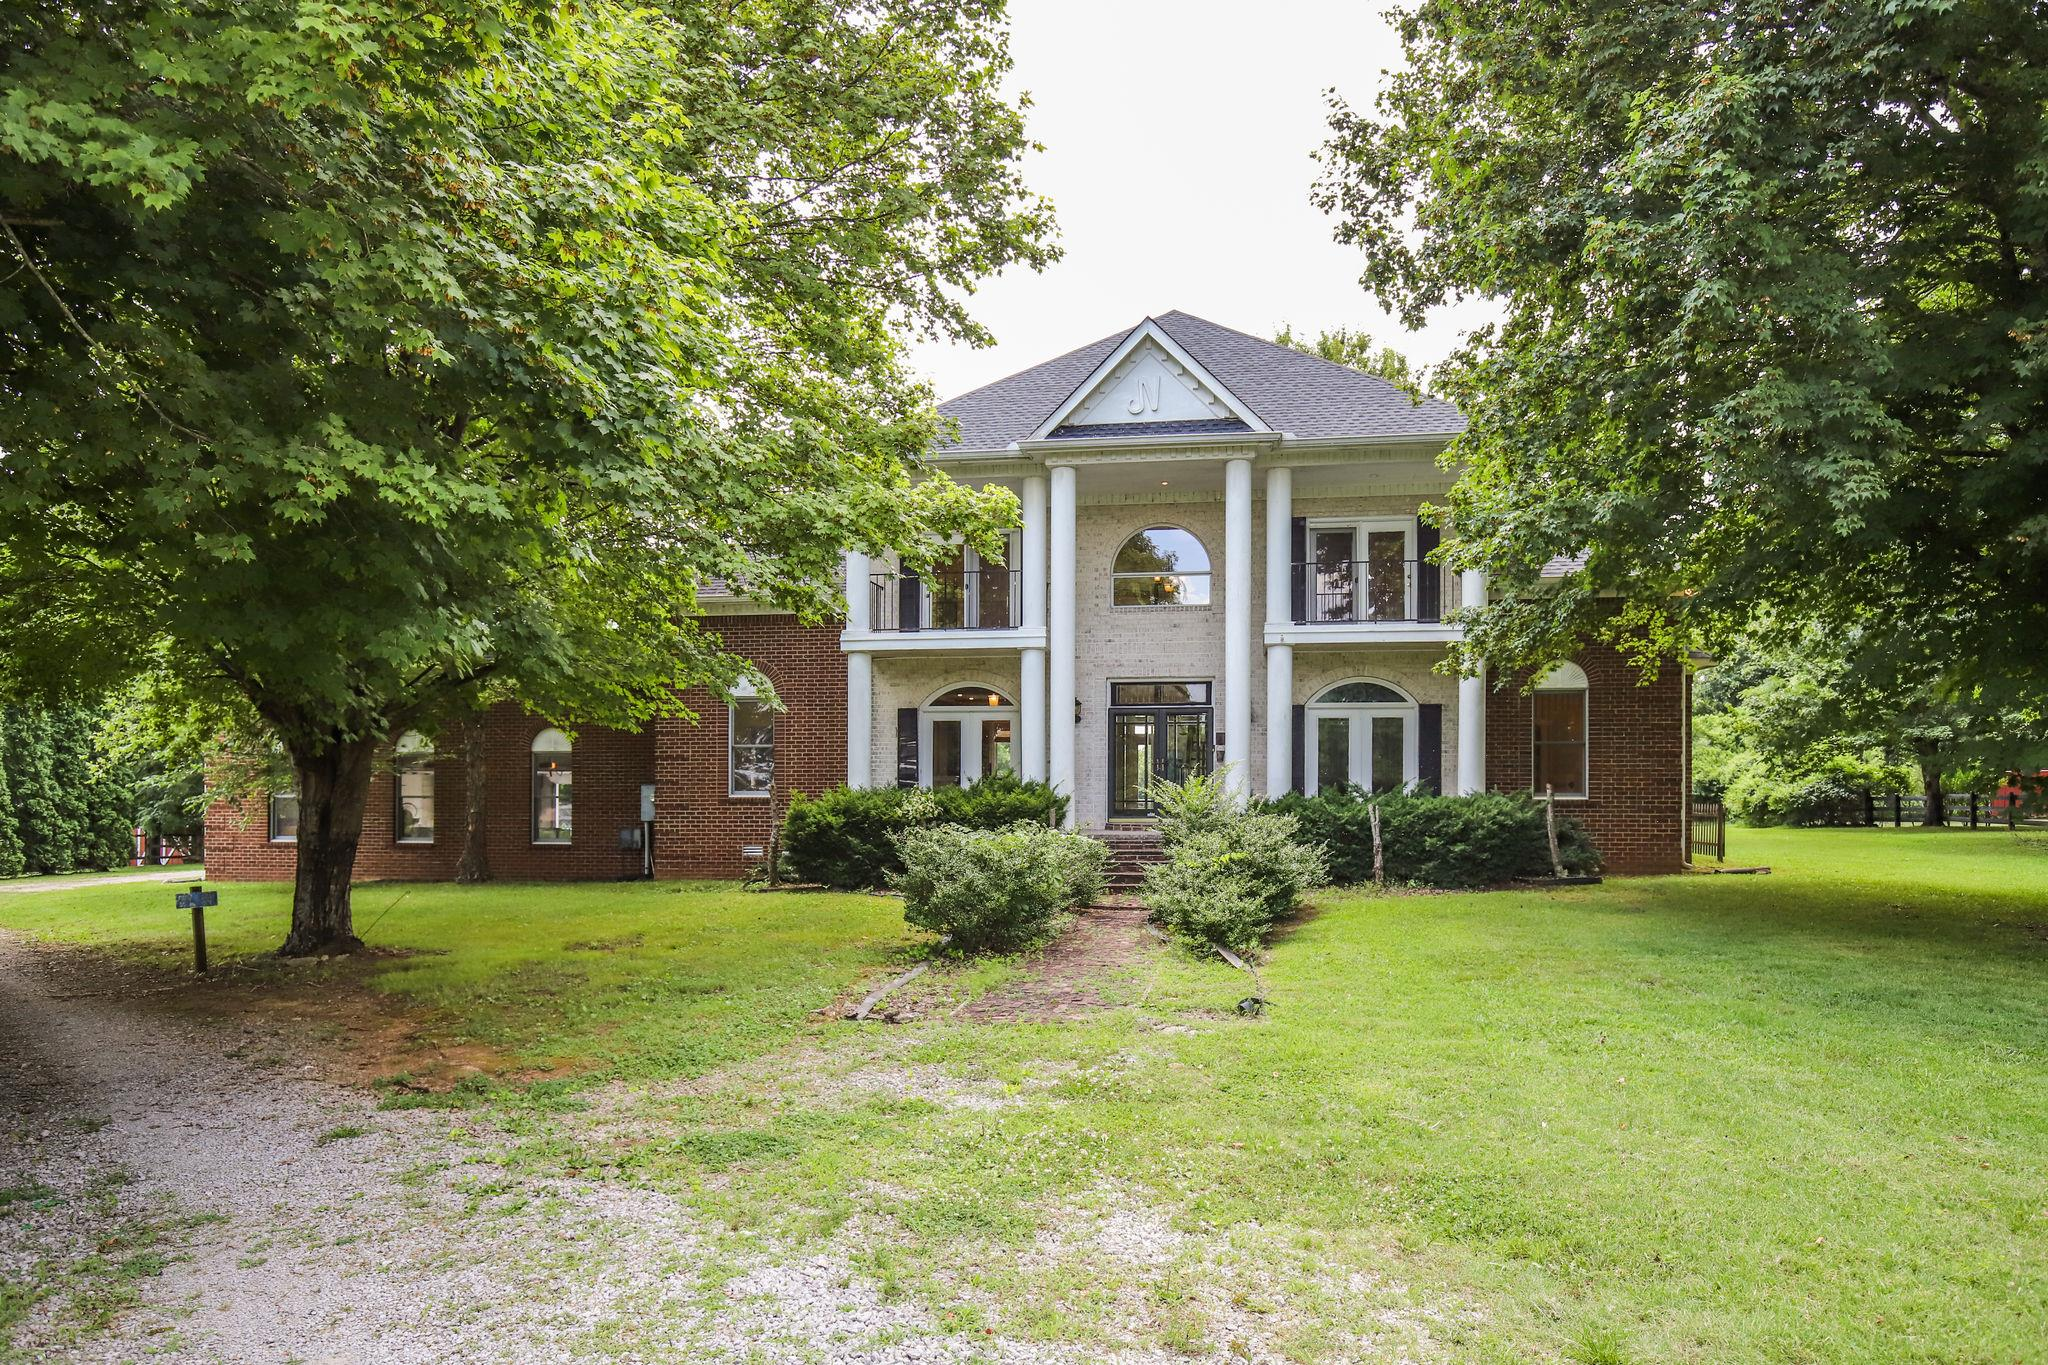 1504 Guill Rd, Mount Juliet, TN 37122 - Mount Juliet, TN real estate listing